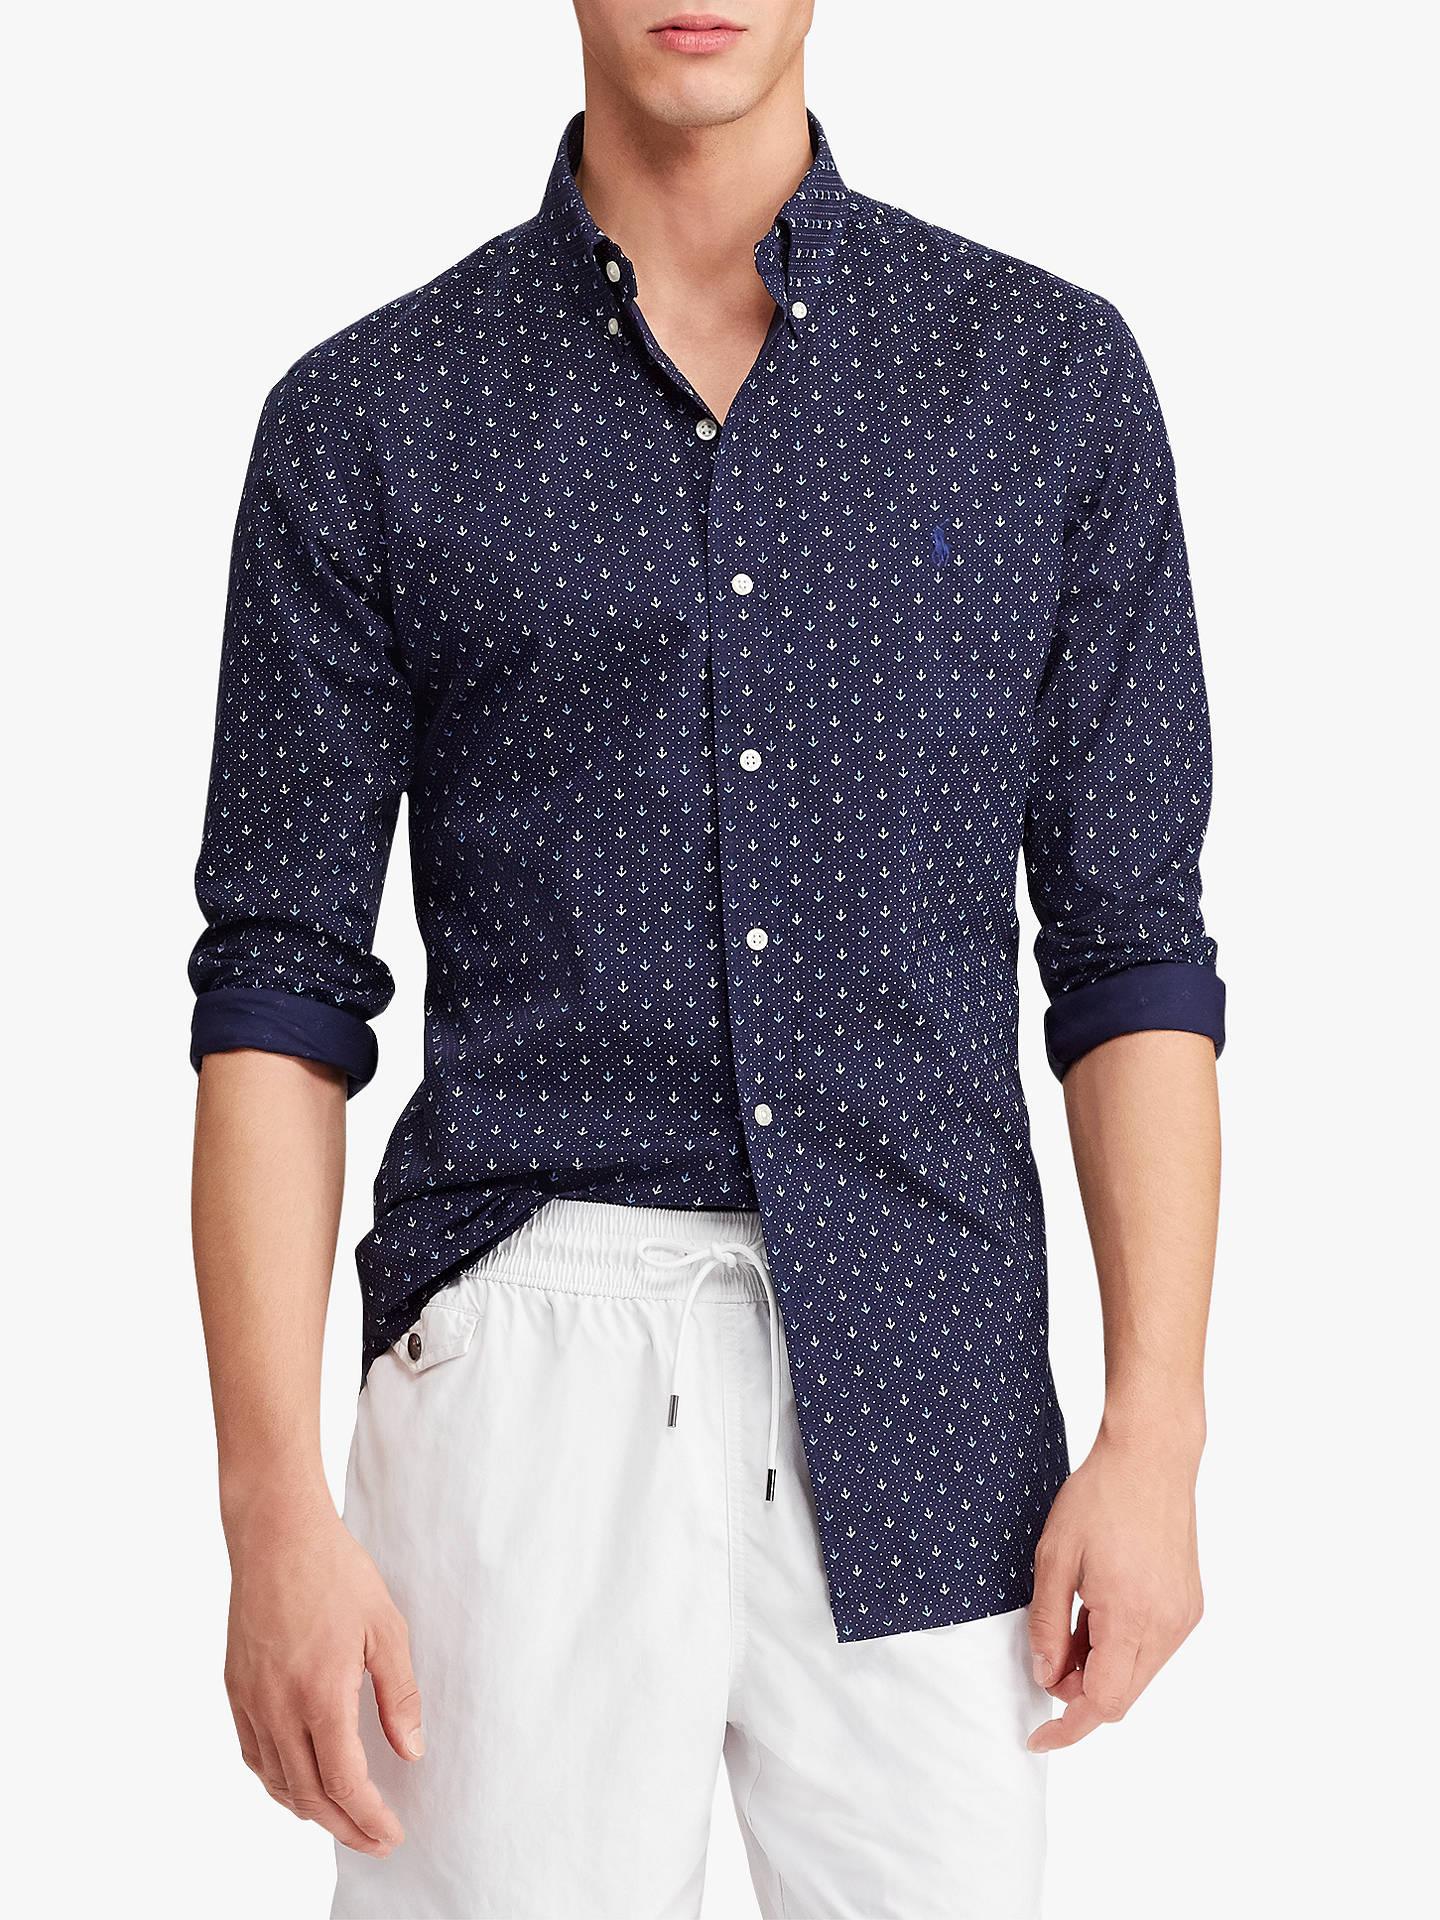 166e6d07da84 Buy Polo Ralph Lauren Slim Fit Mini Anchor Dot Print Shirt